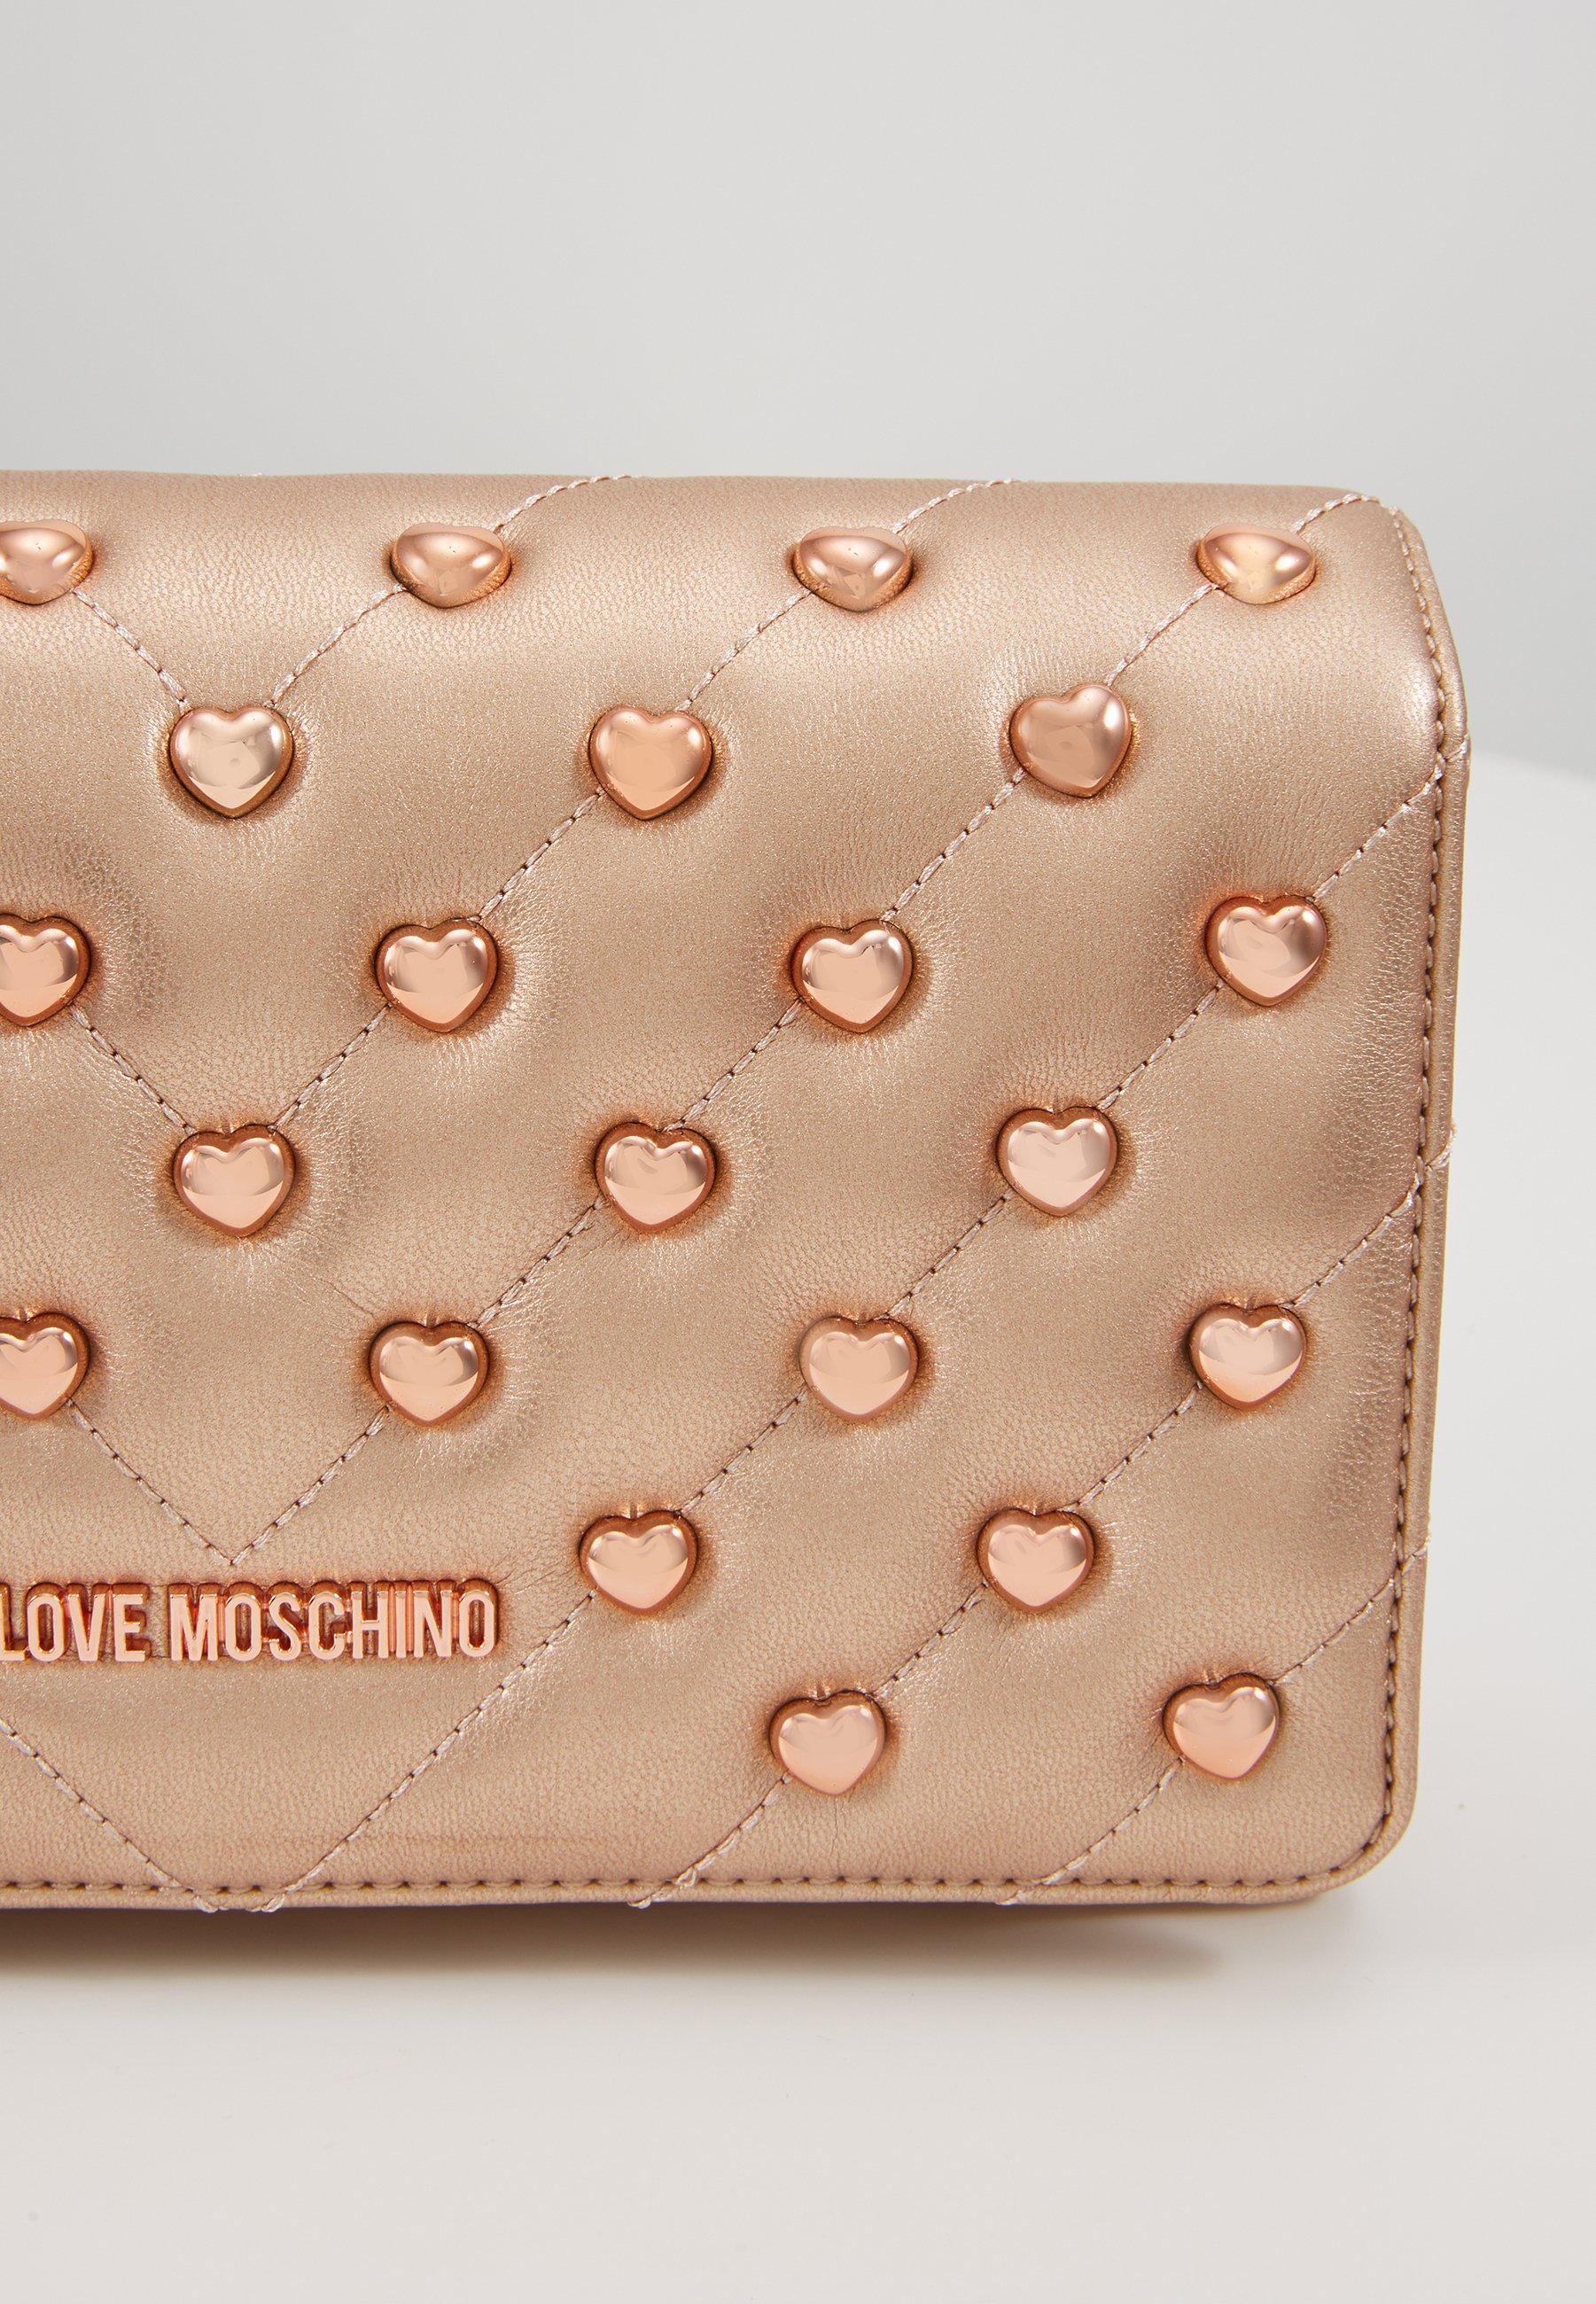 Love Moschino Sac Bandoulière - Rose Gold